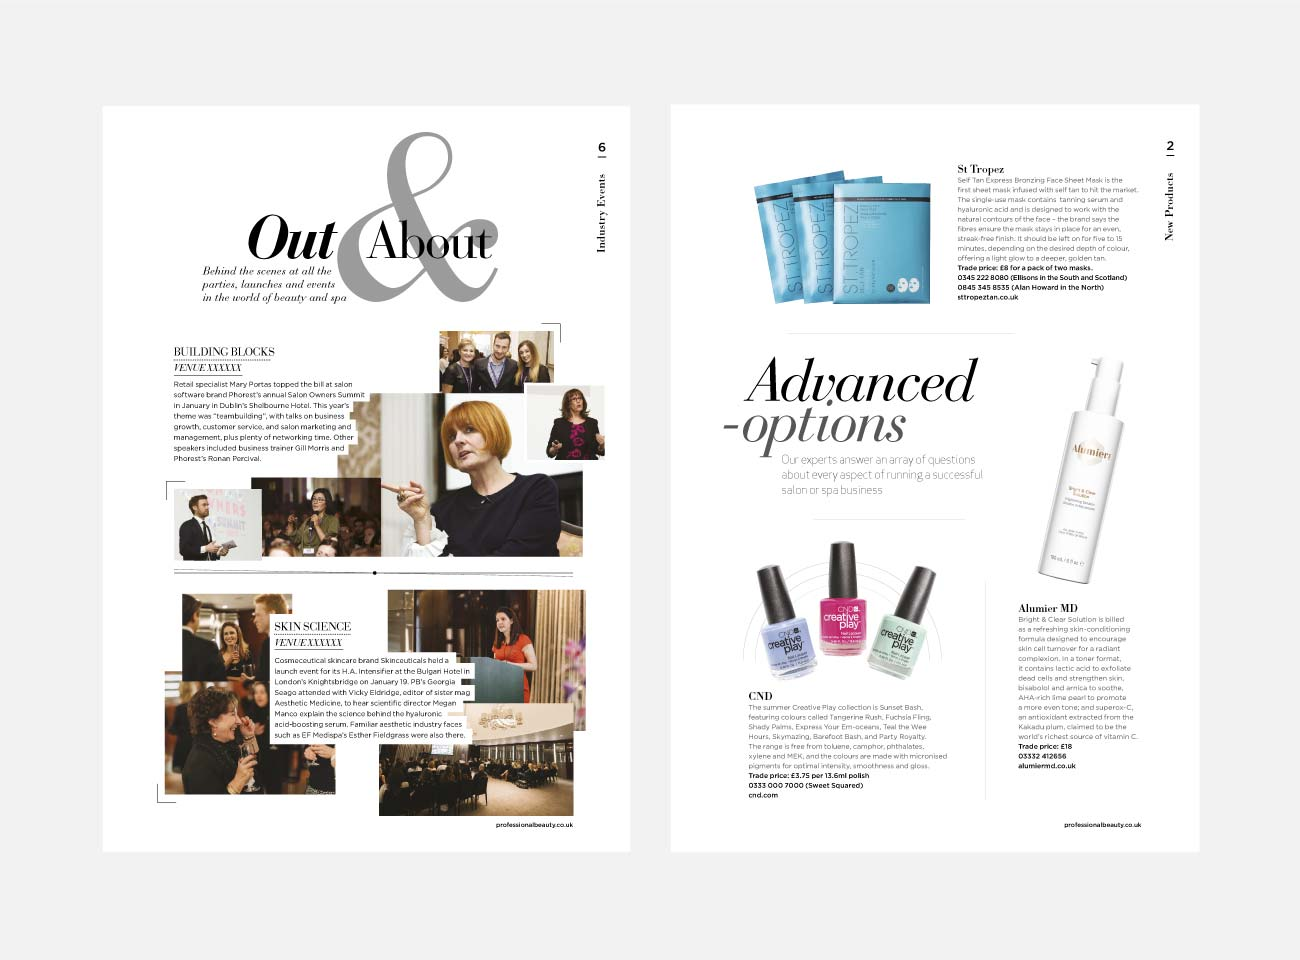 Professional Beauty Magazine Design   John Shannon   Graphic Designer   Brighton